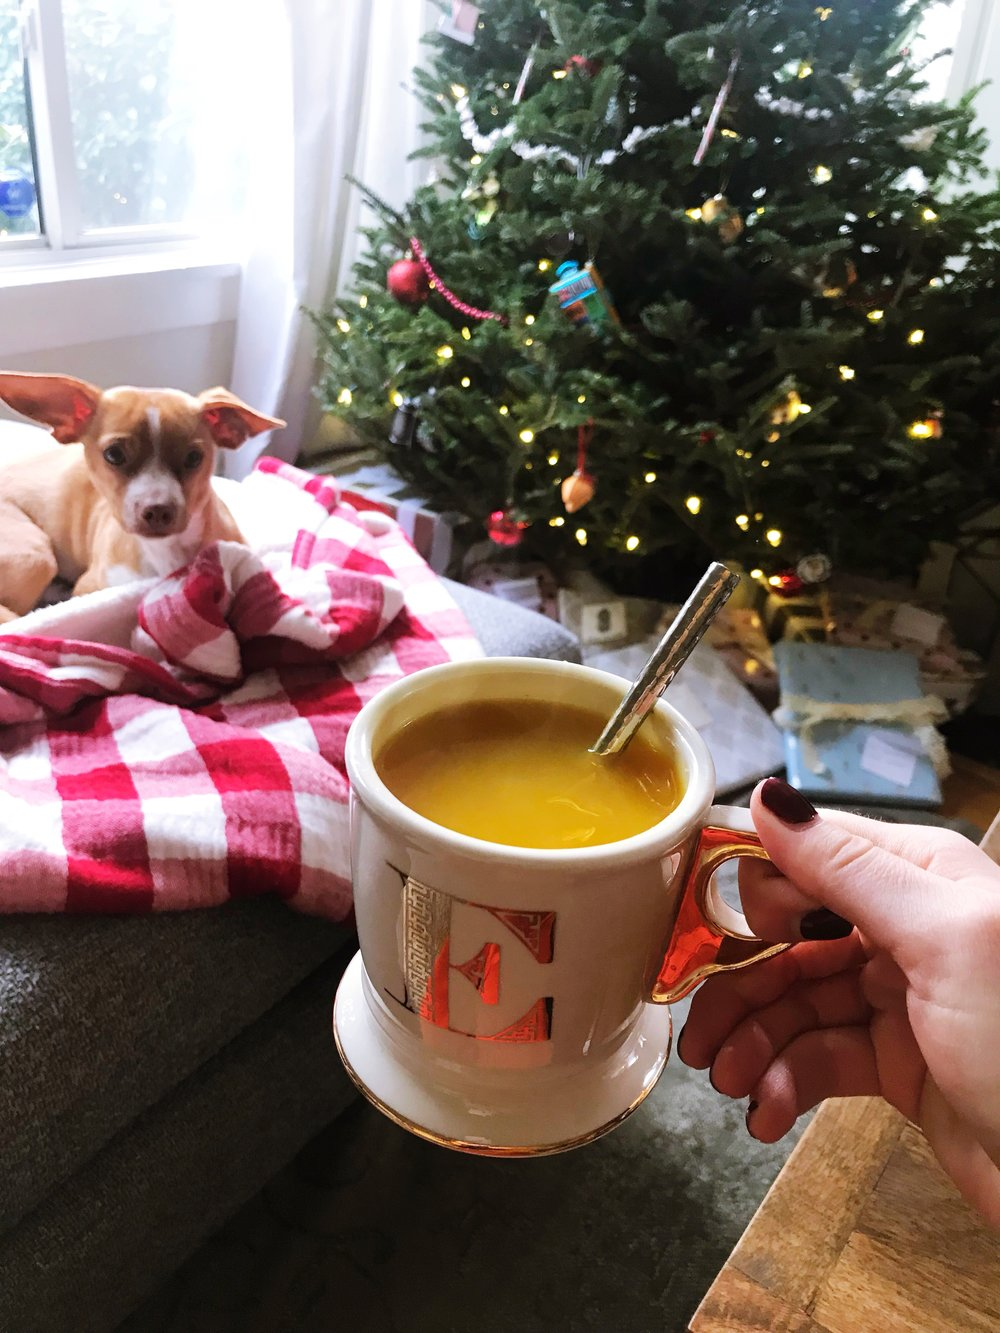 Bean_Christmas_Mug.JPG